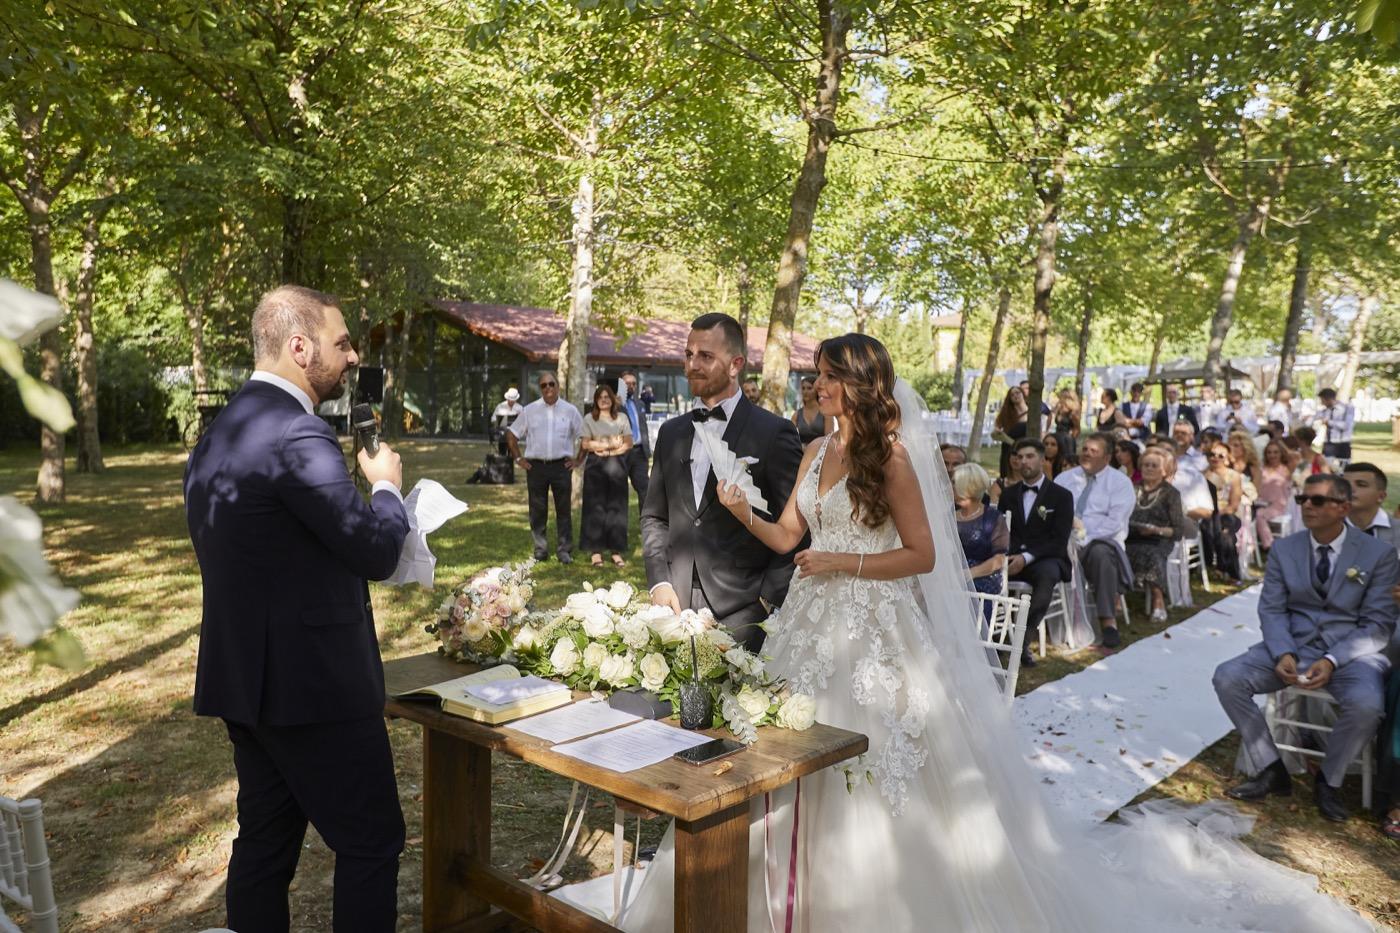 Claudio-Coppola-wedding-photographer-la-scuderia-eventi-preparativi-la-rosetta-perugia-53